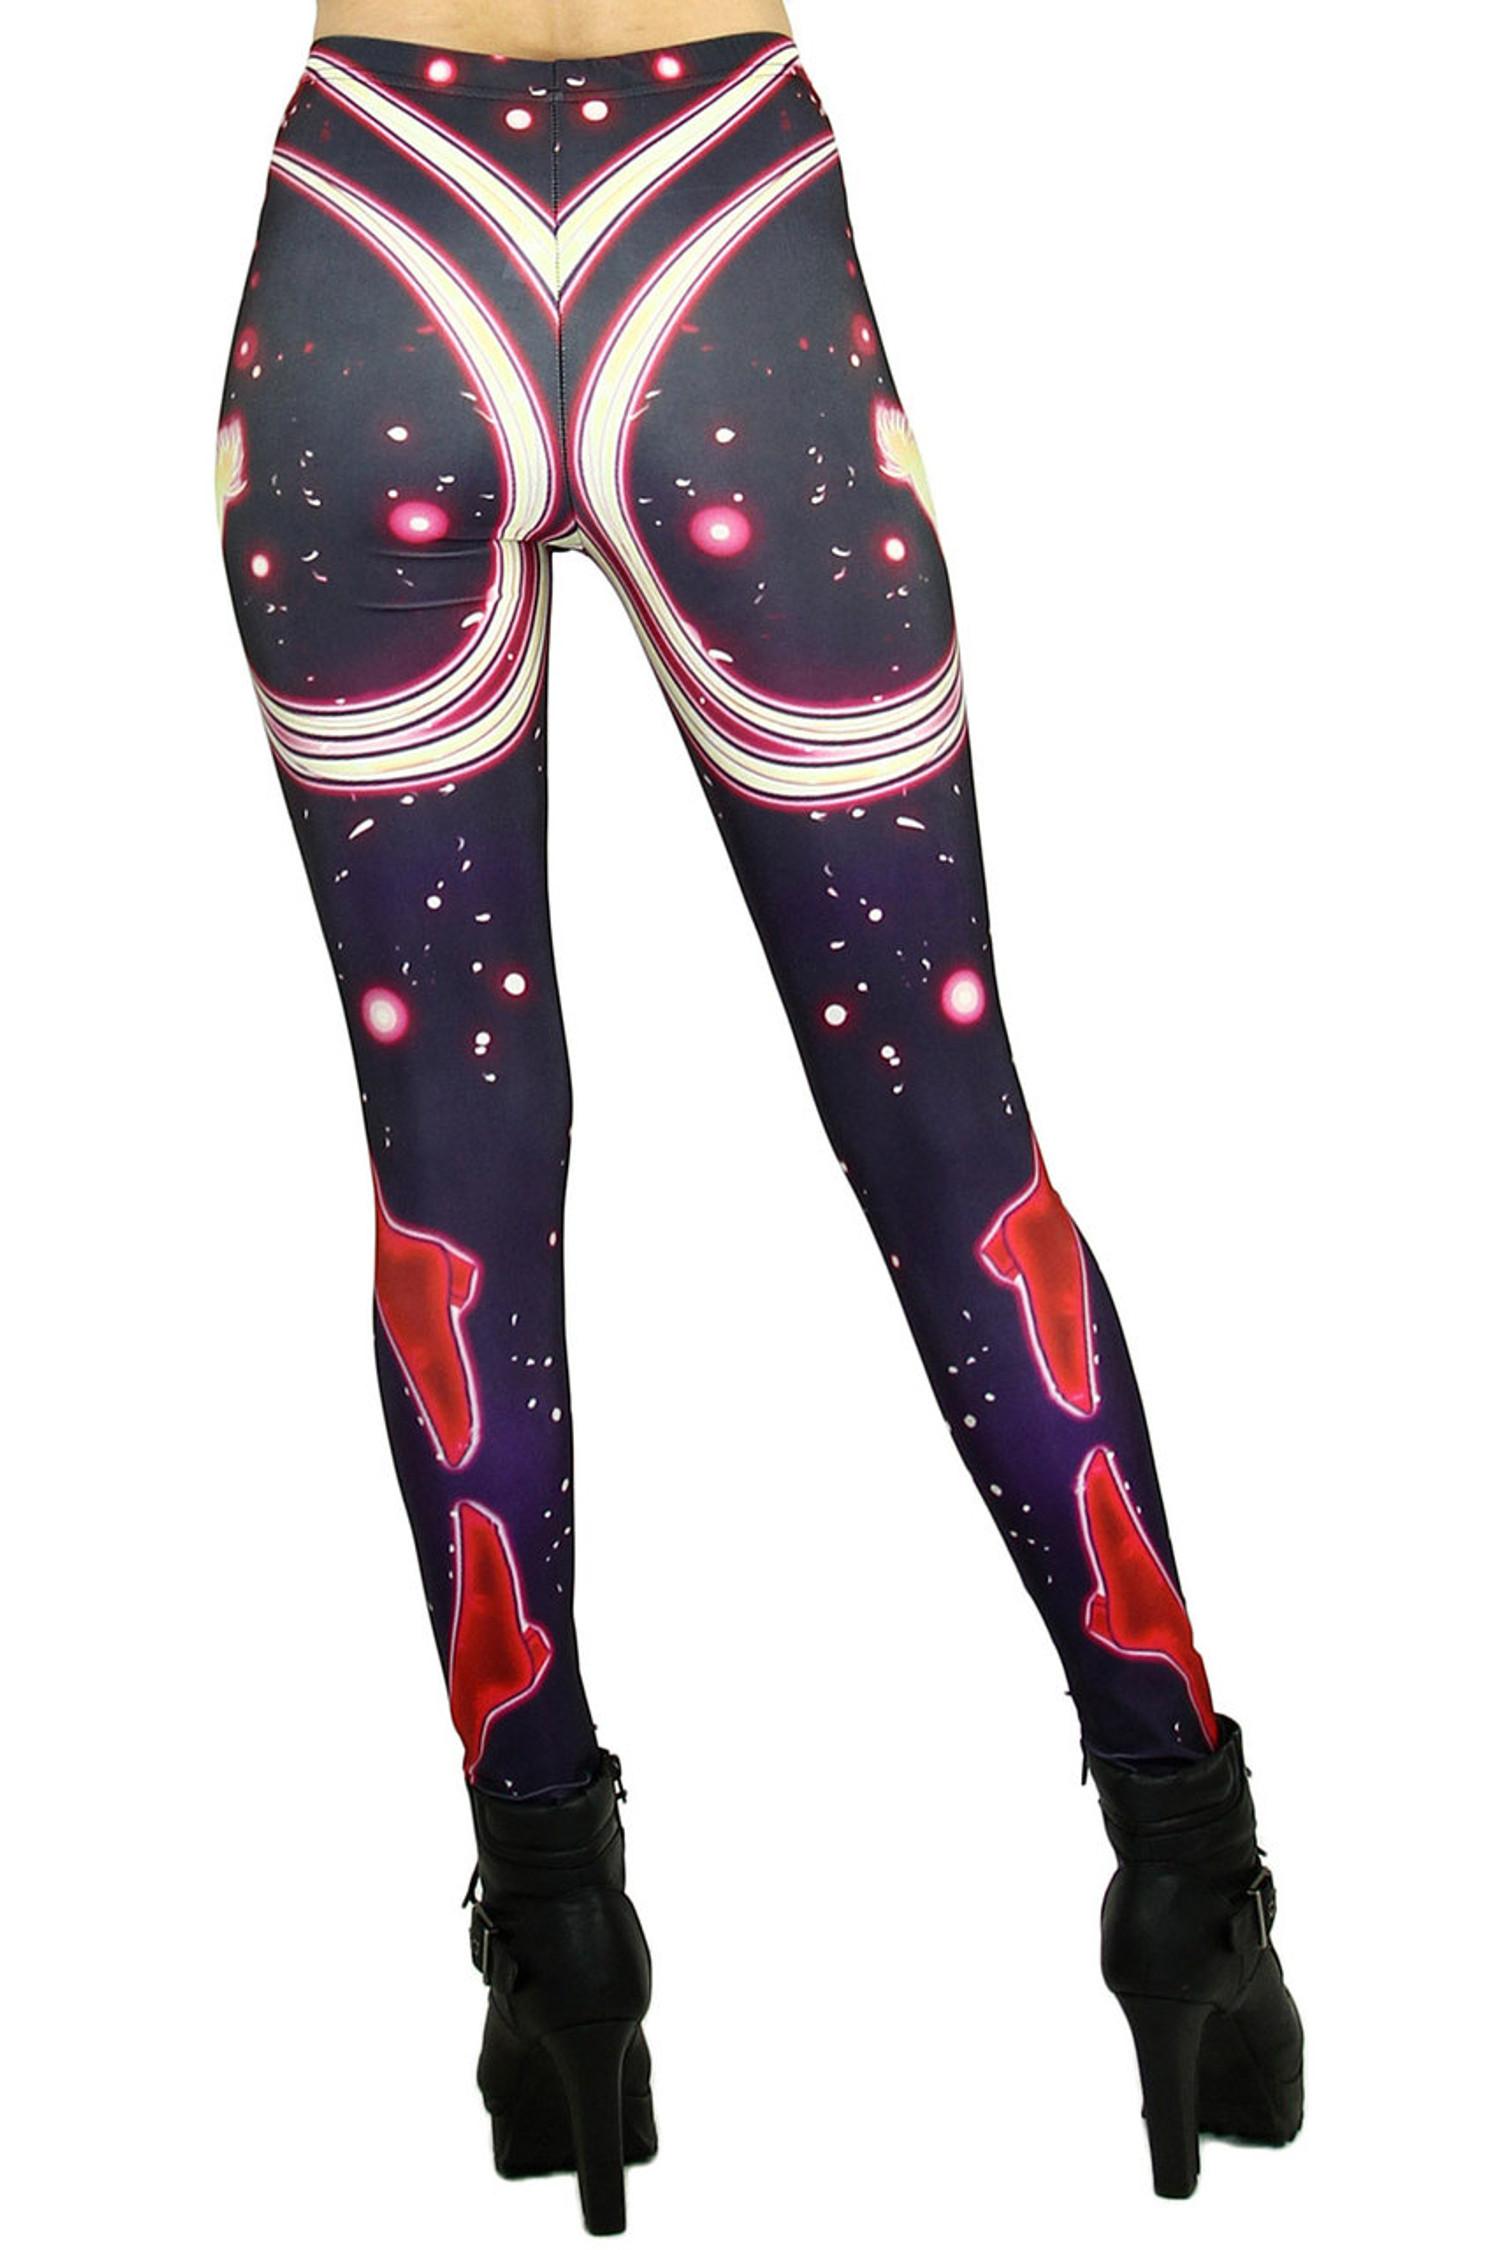 Galactic Sailor Moon Leggings